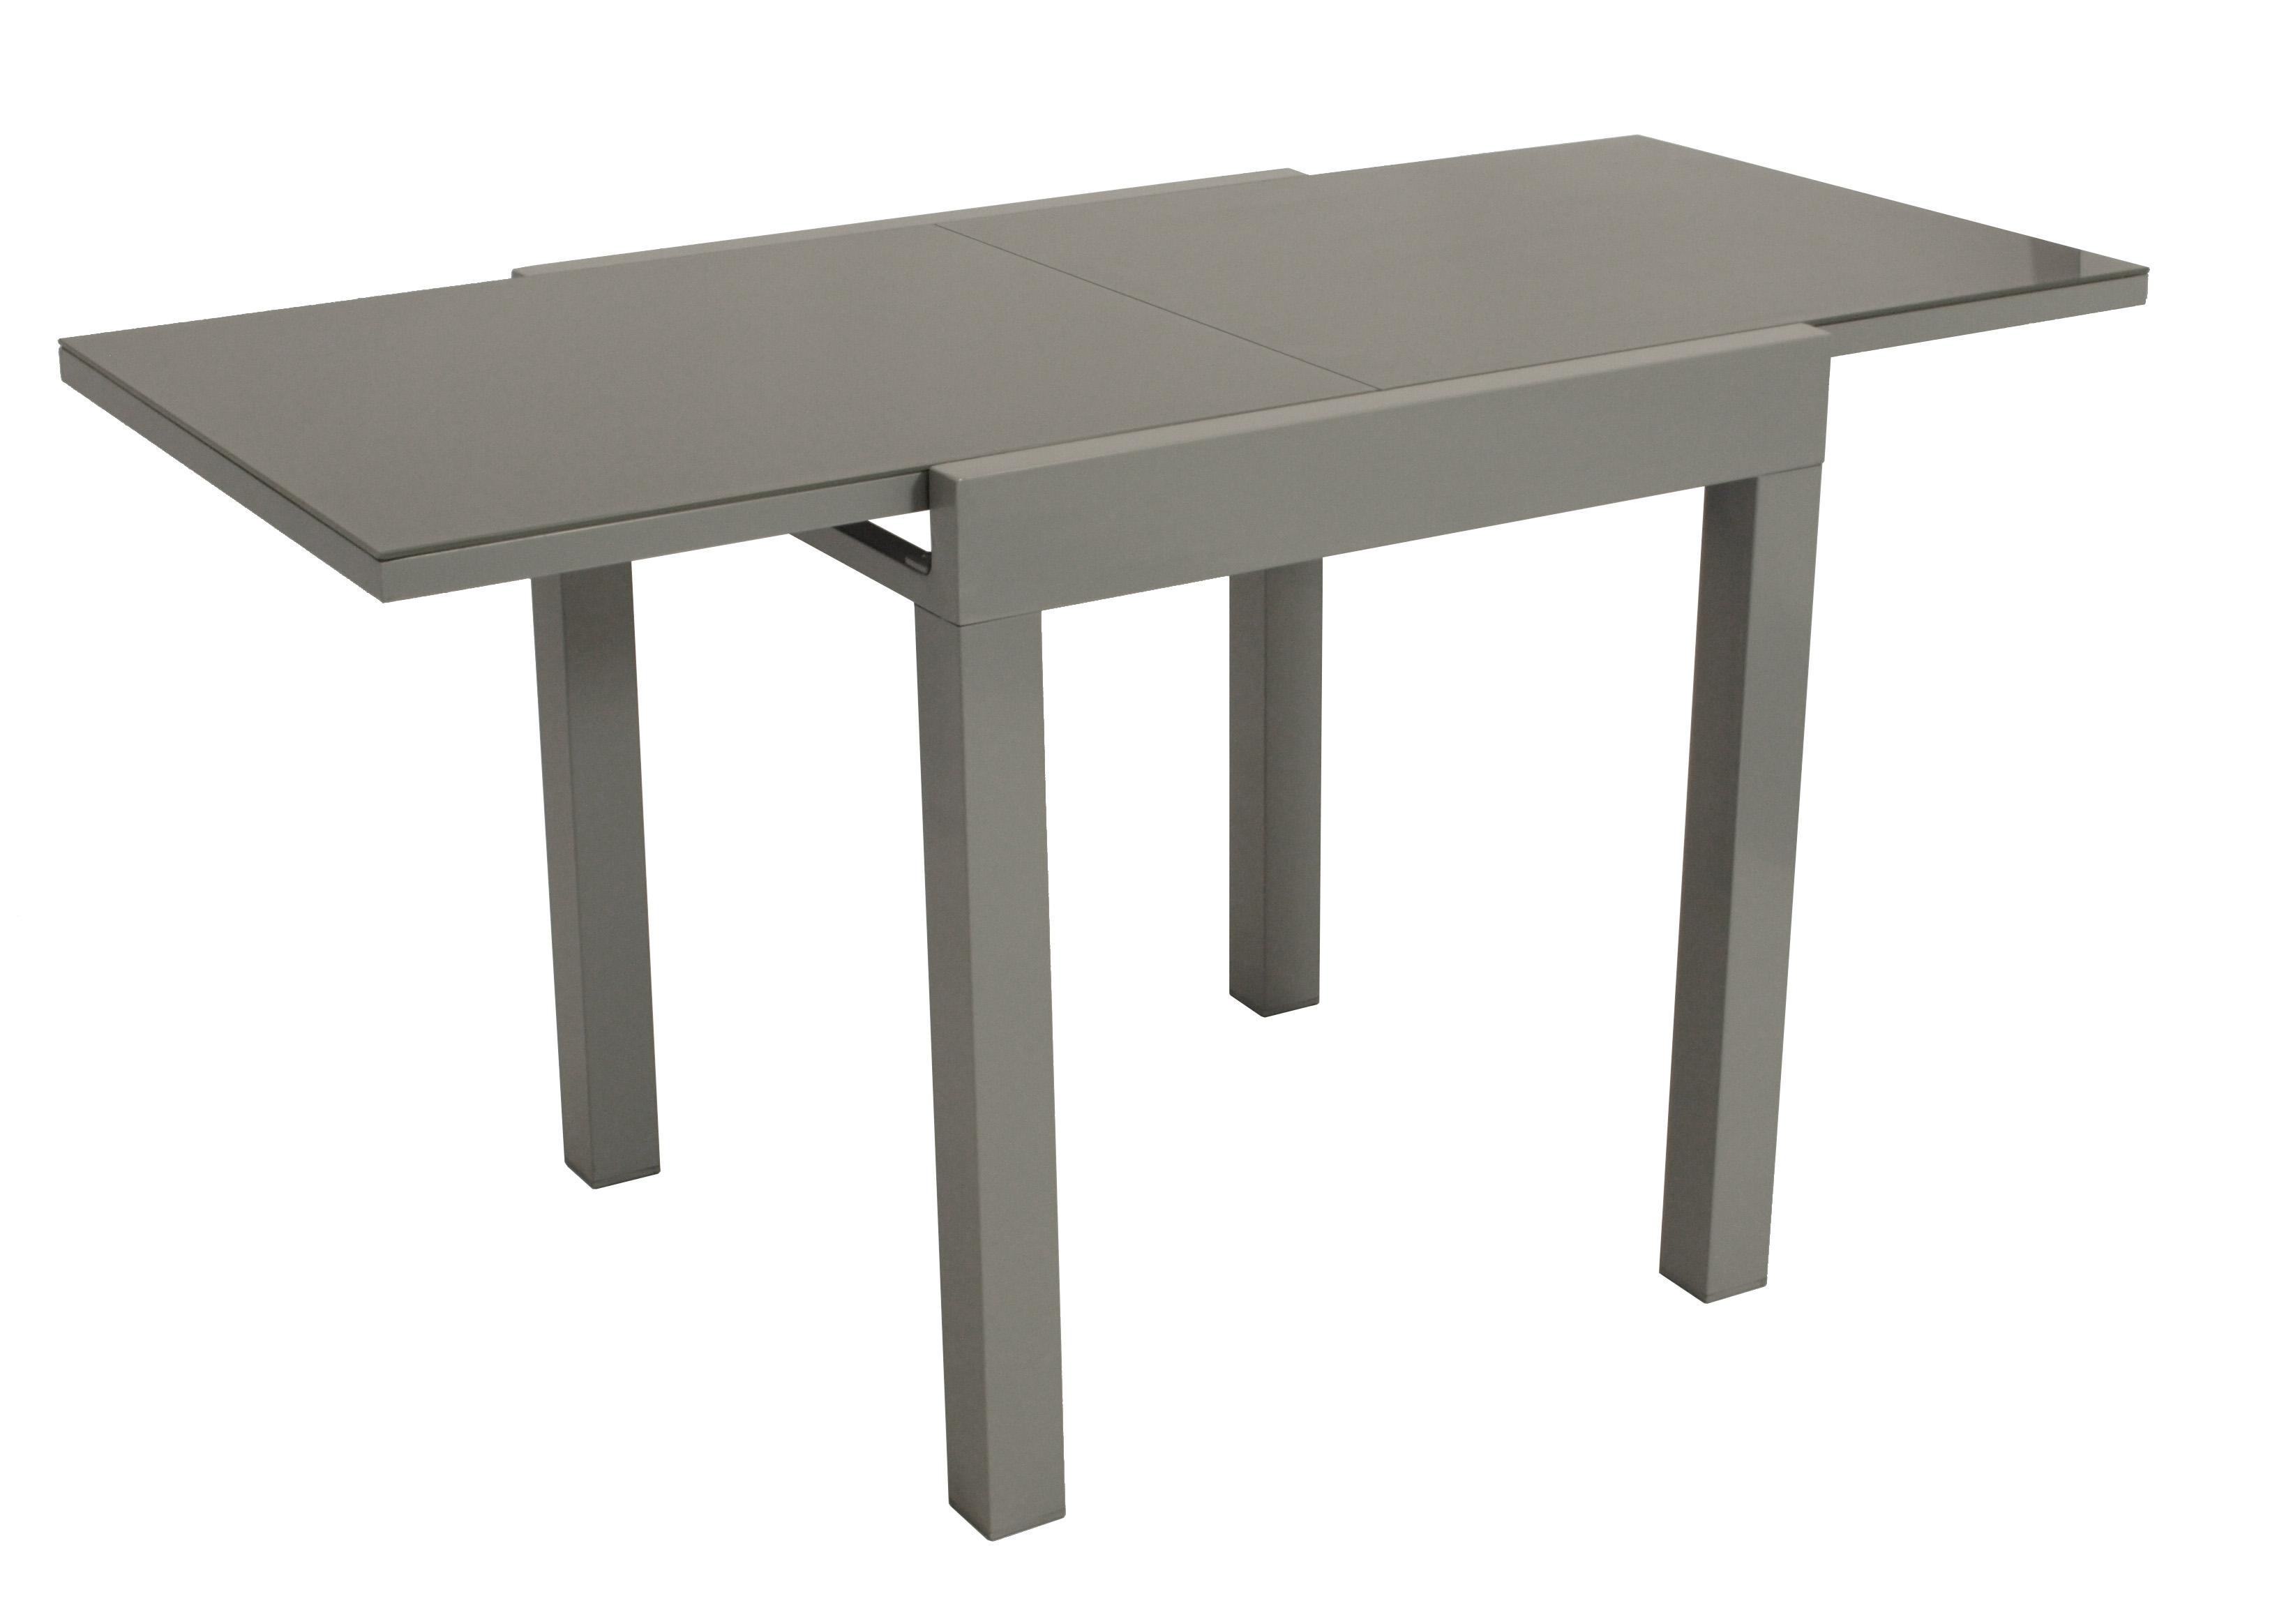 Balkon-Ausziehtisch MARINA 70/140x70cm, Aluminium silbergrau + Glas grau